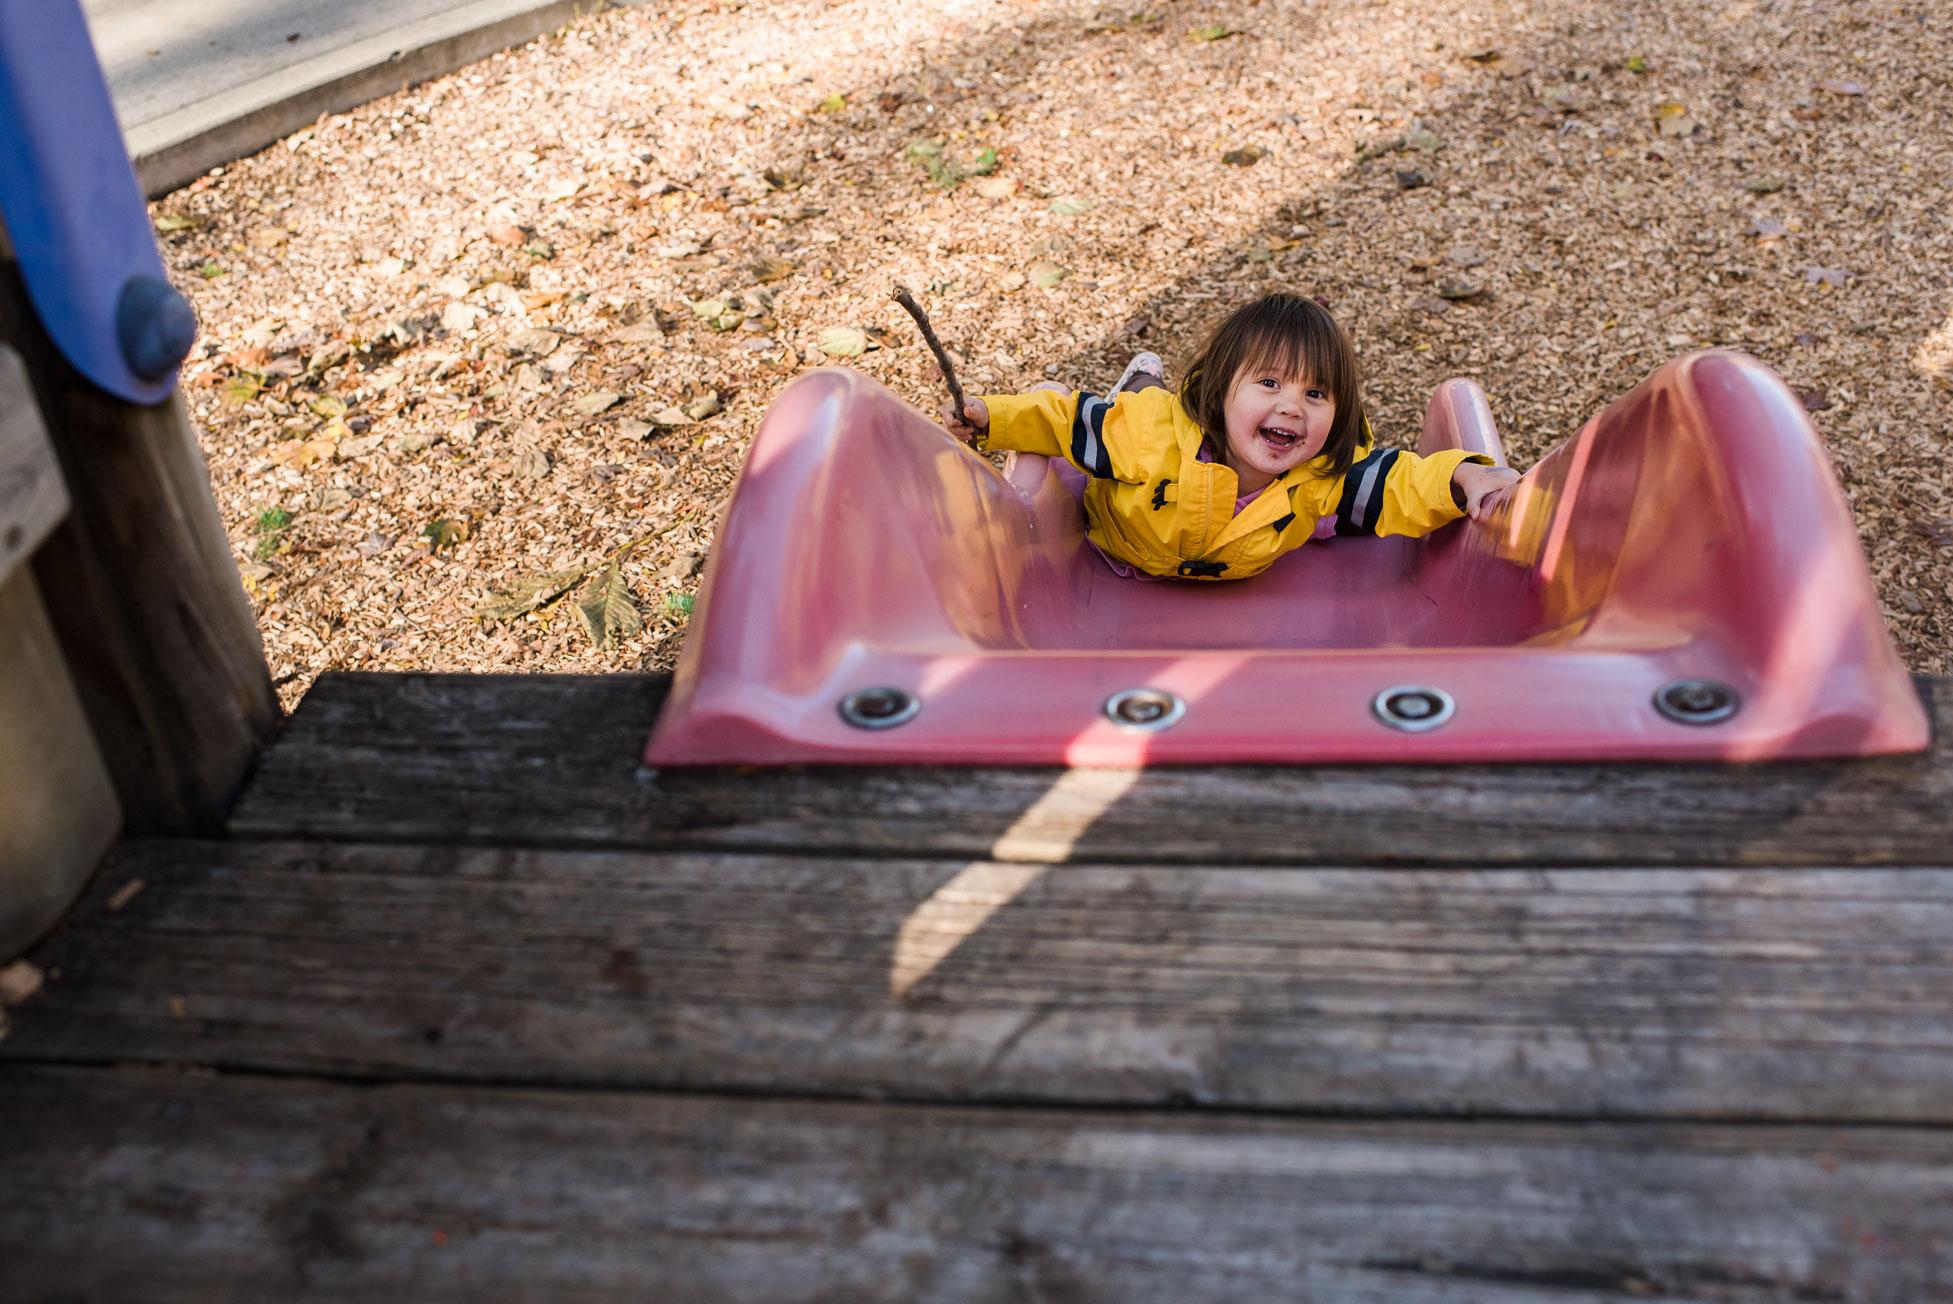 Grant Park and Playground   Spokane Photographer   November 5-on-5